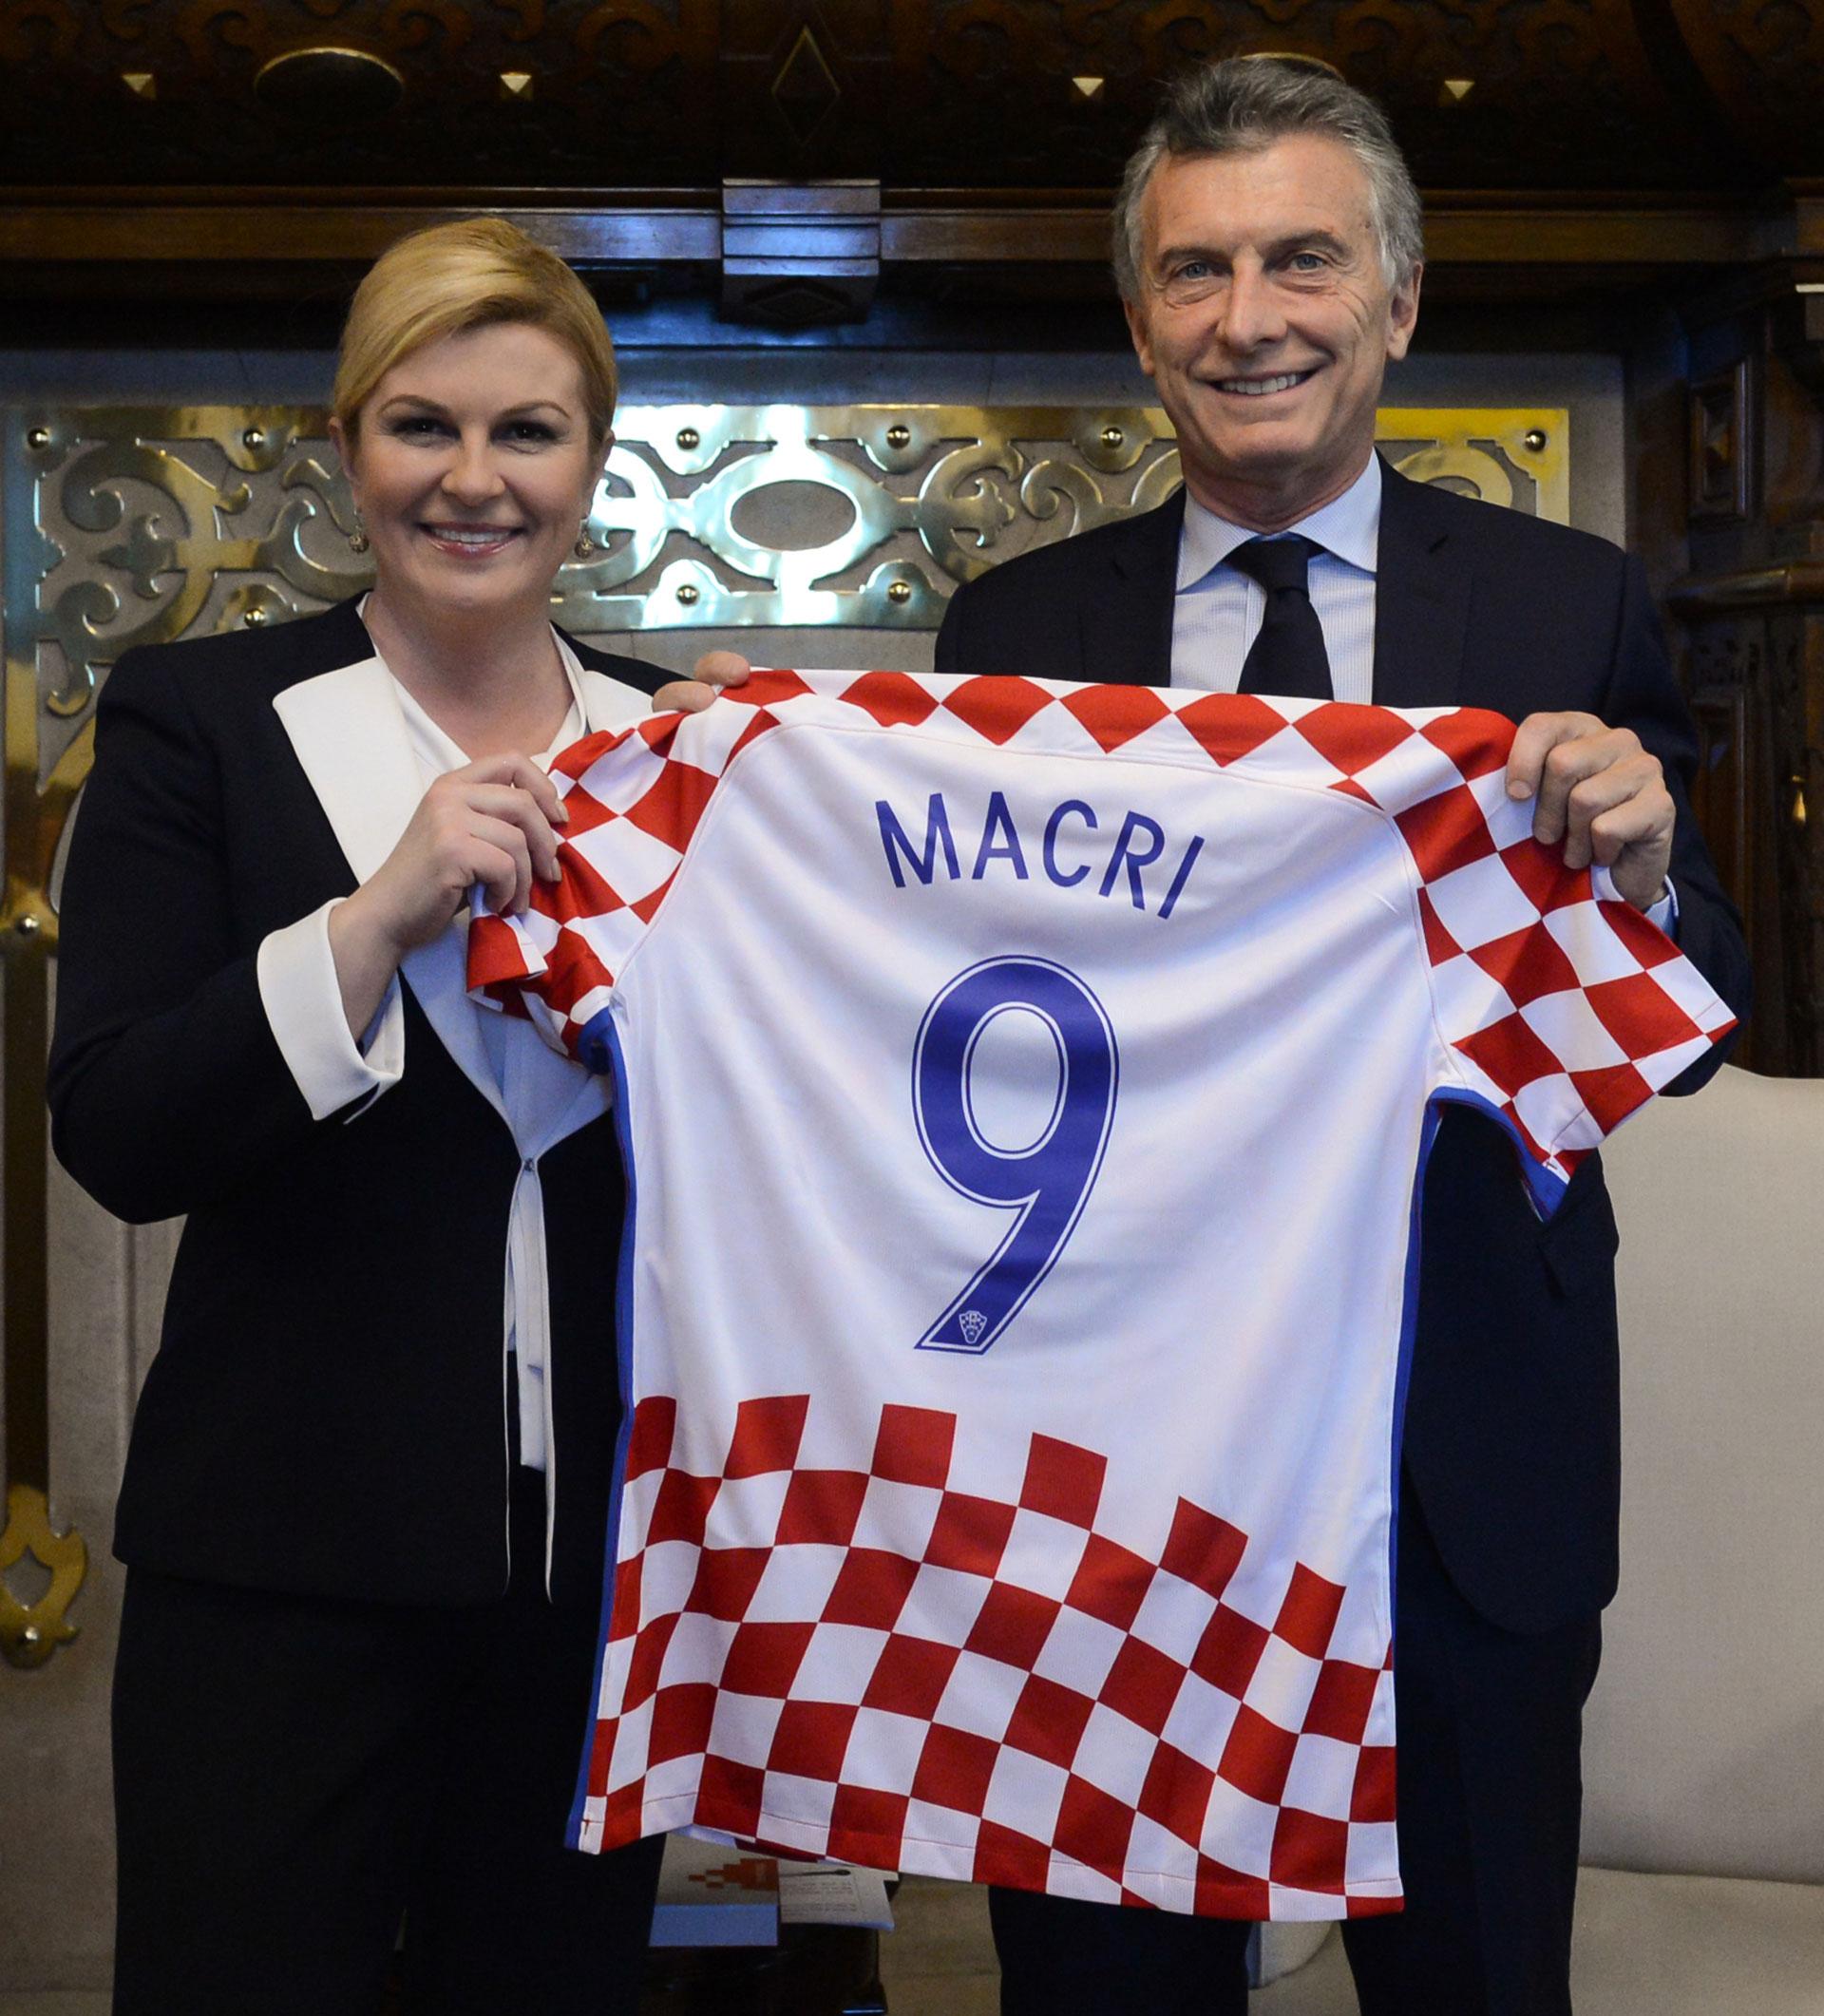 Macri junto a la presidente de Croacia, Kolinda Grabar-Kitarovic, el pasado marzo